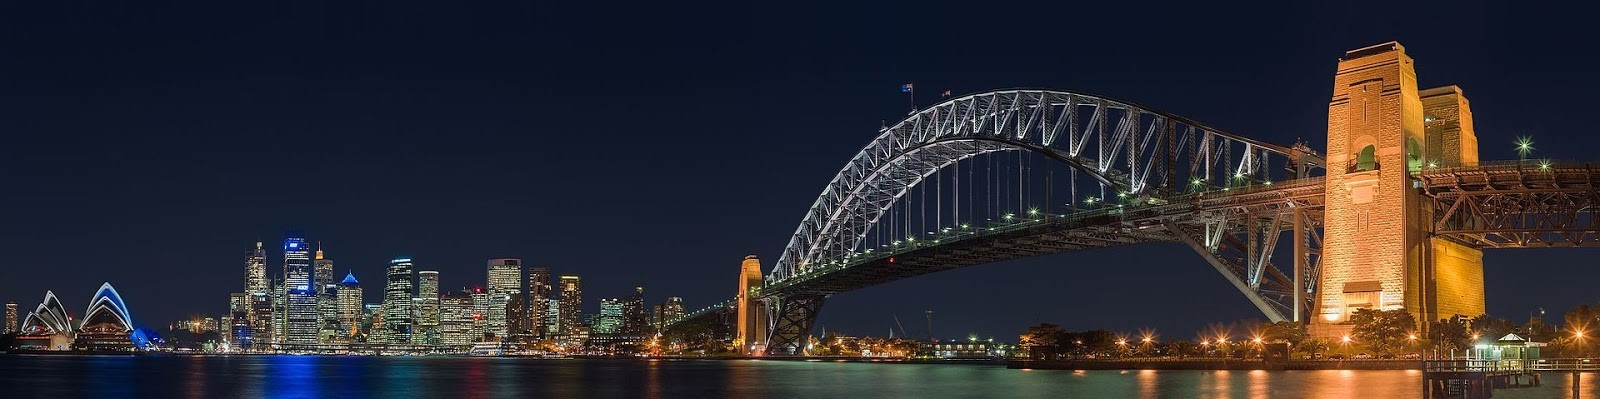 Sydney Harbor Bridge -